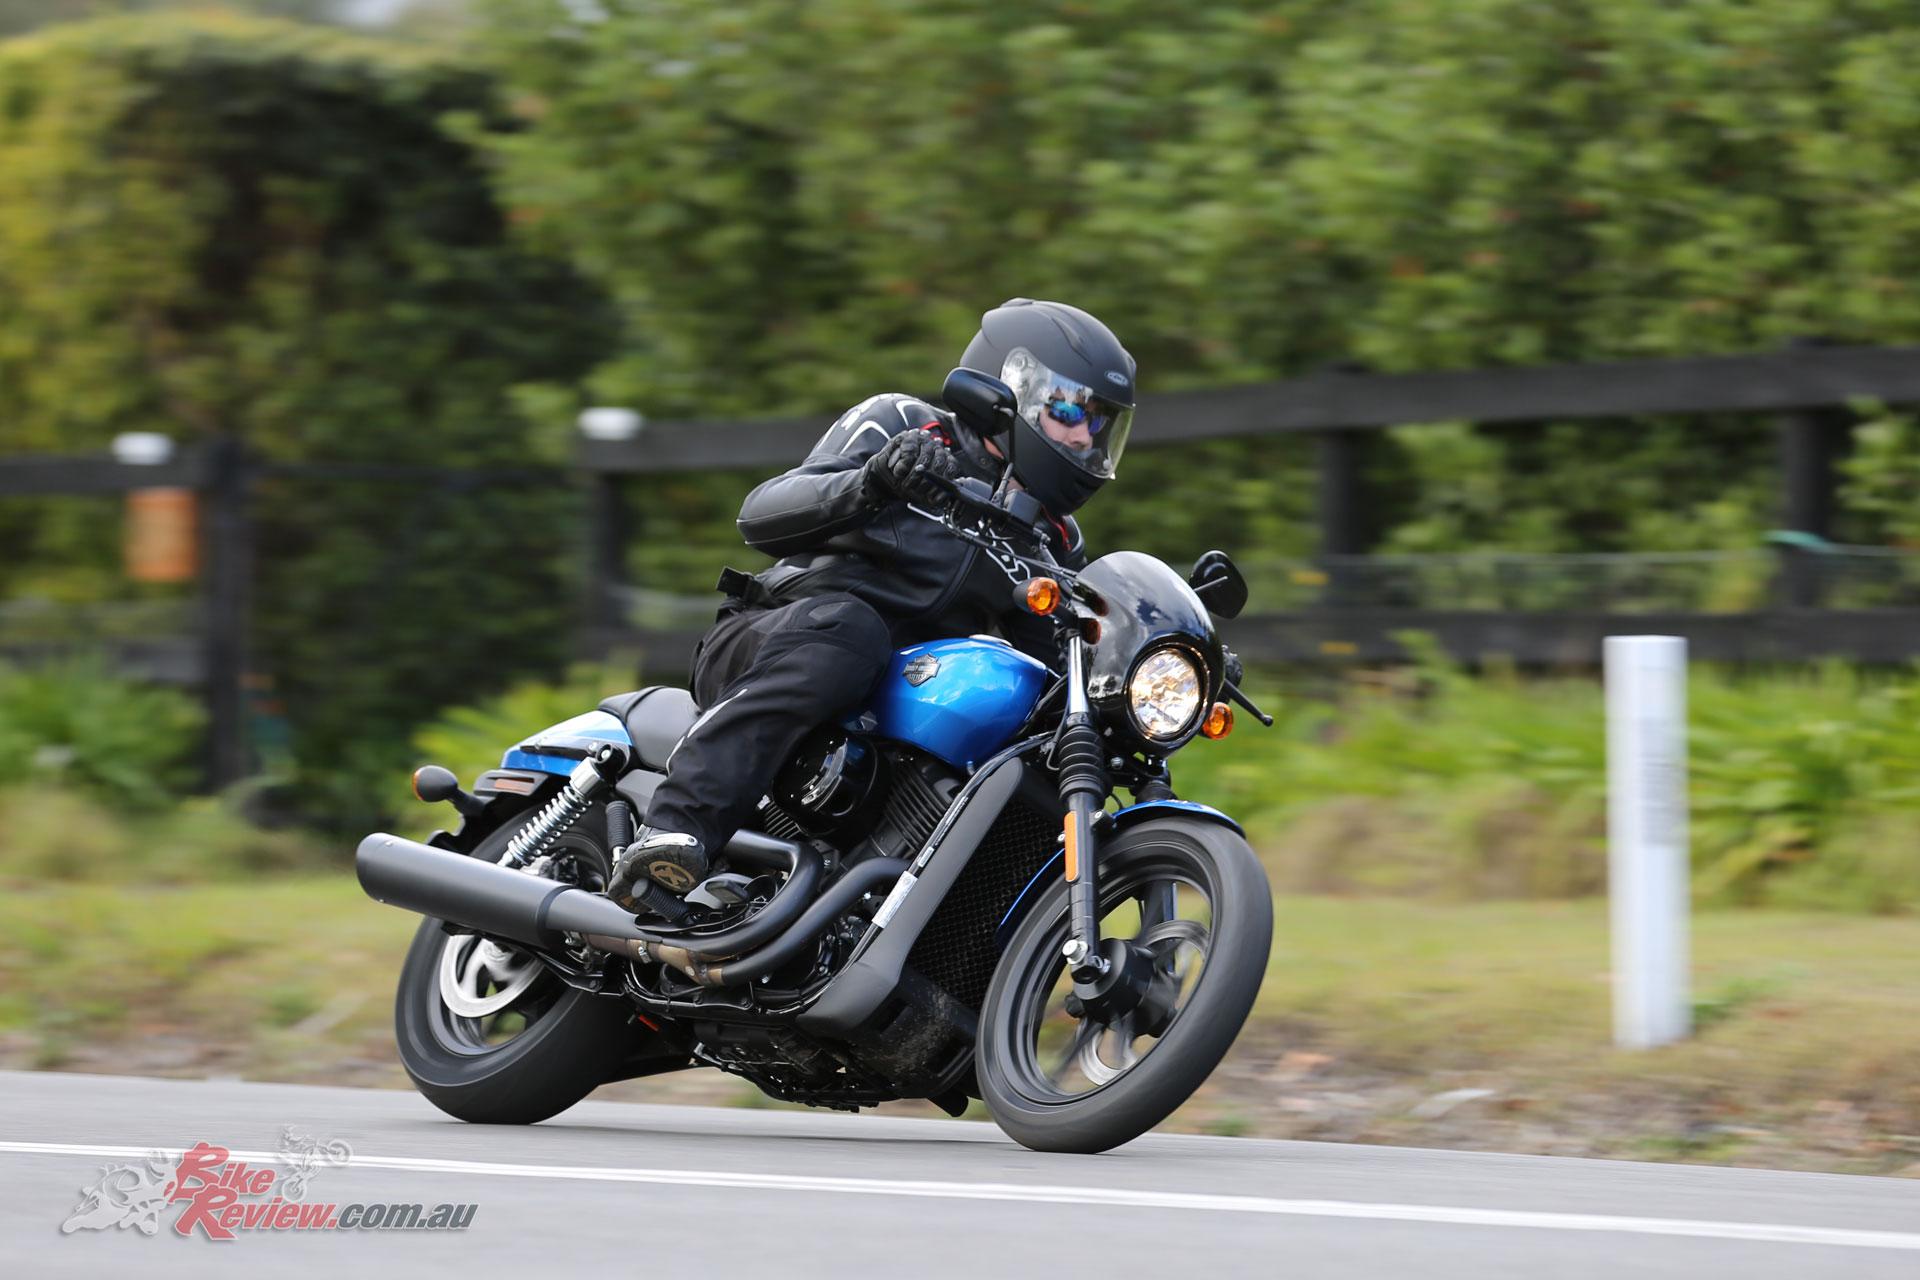 2018 Harley-Davidson Street 500 (LAMS)